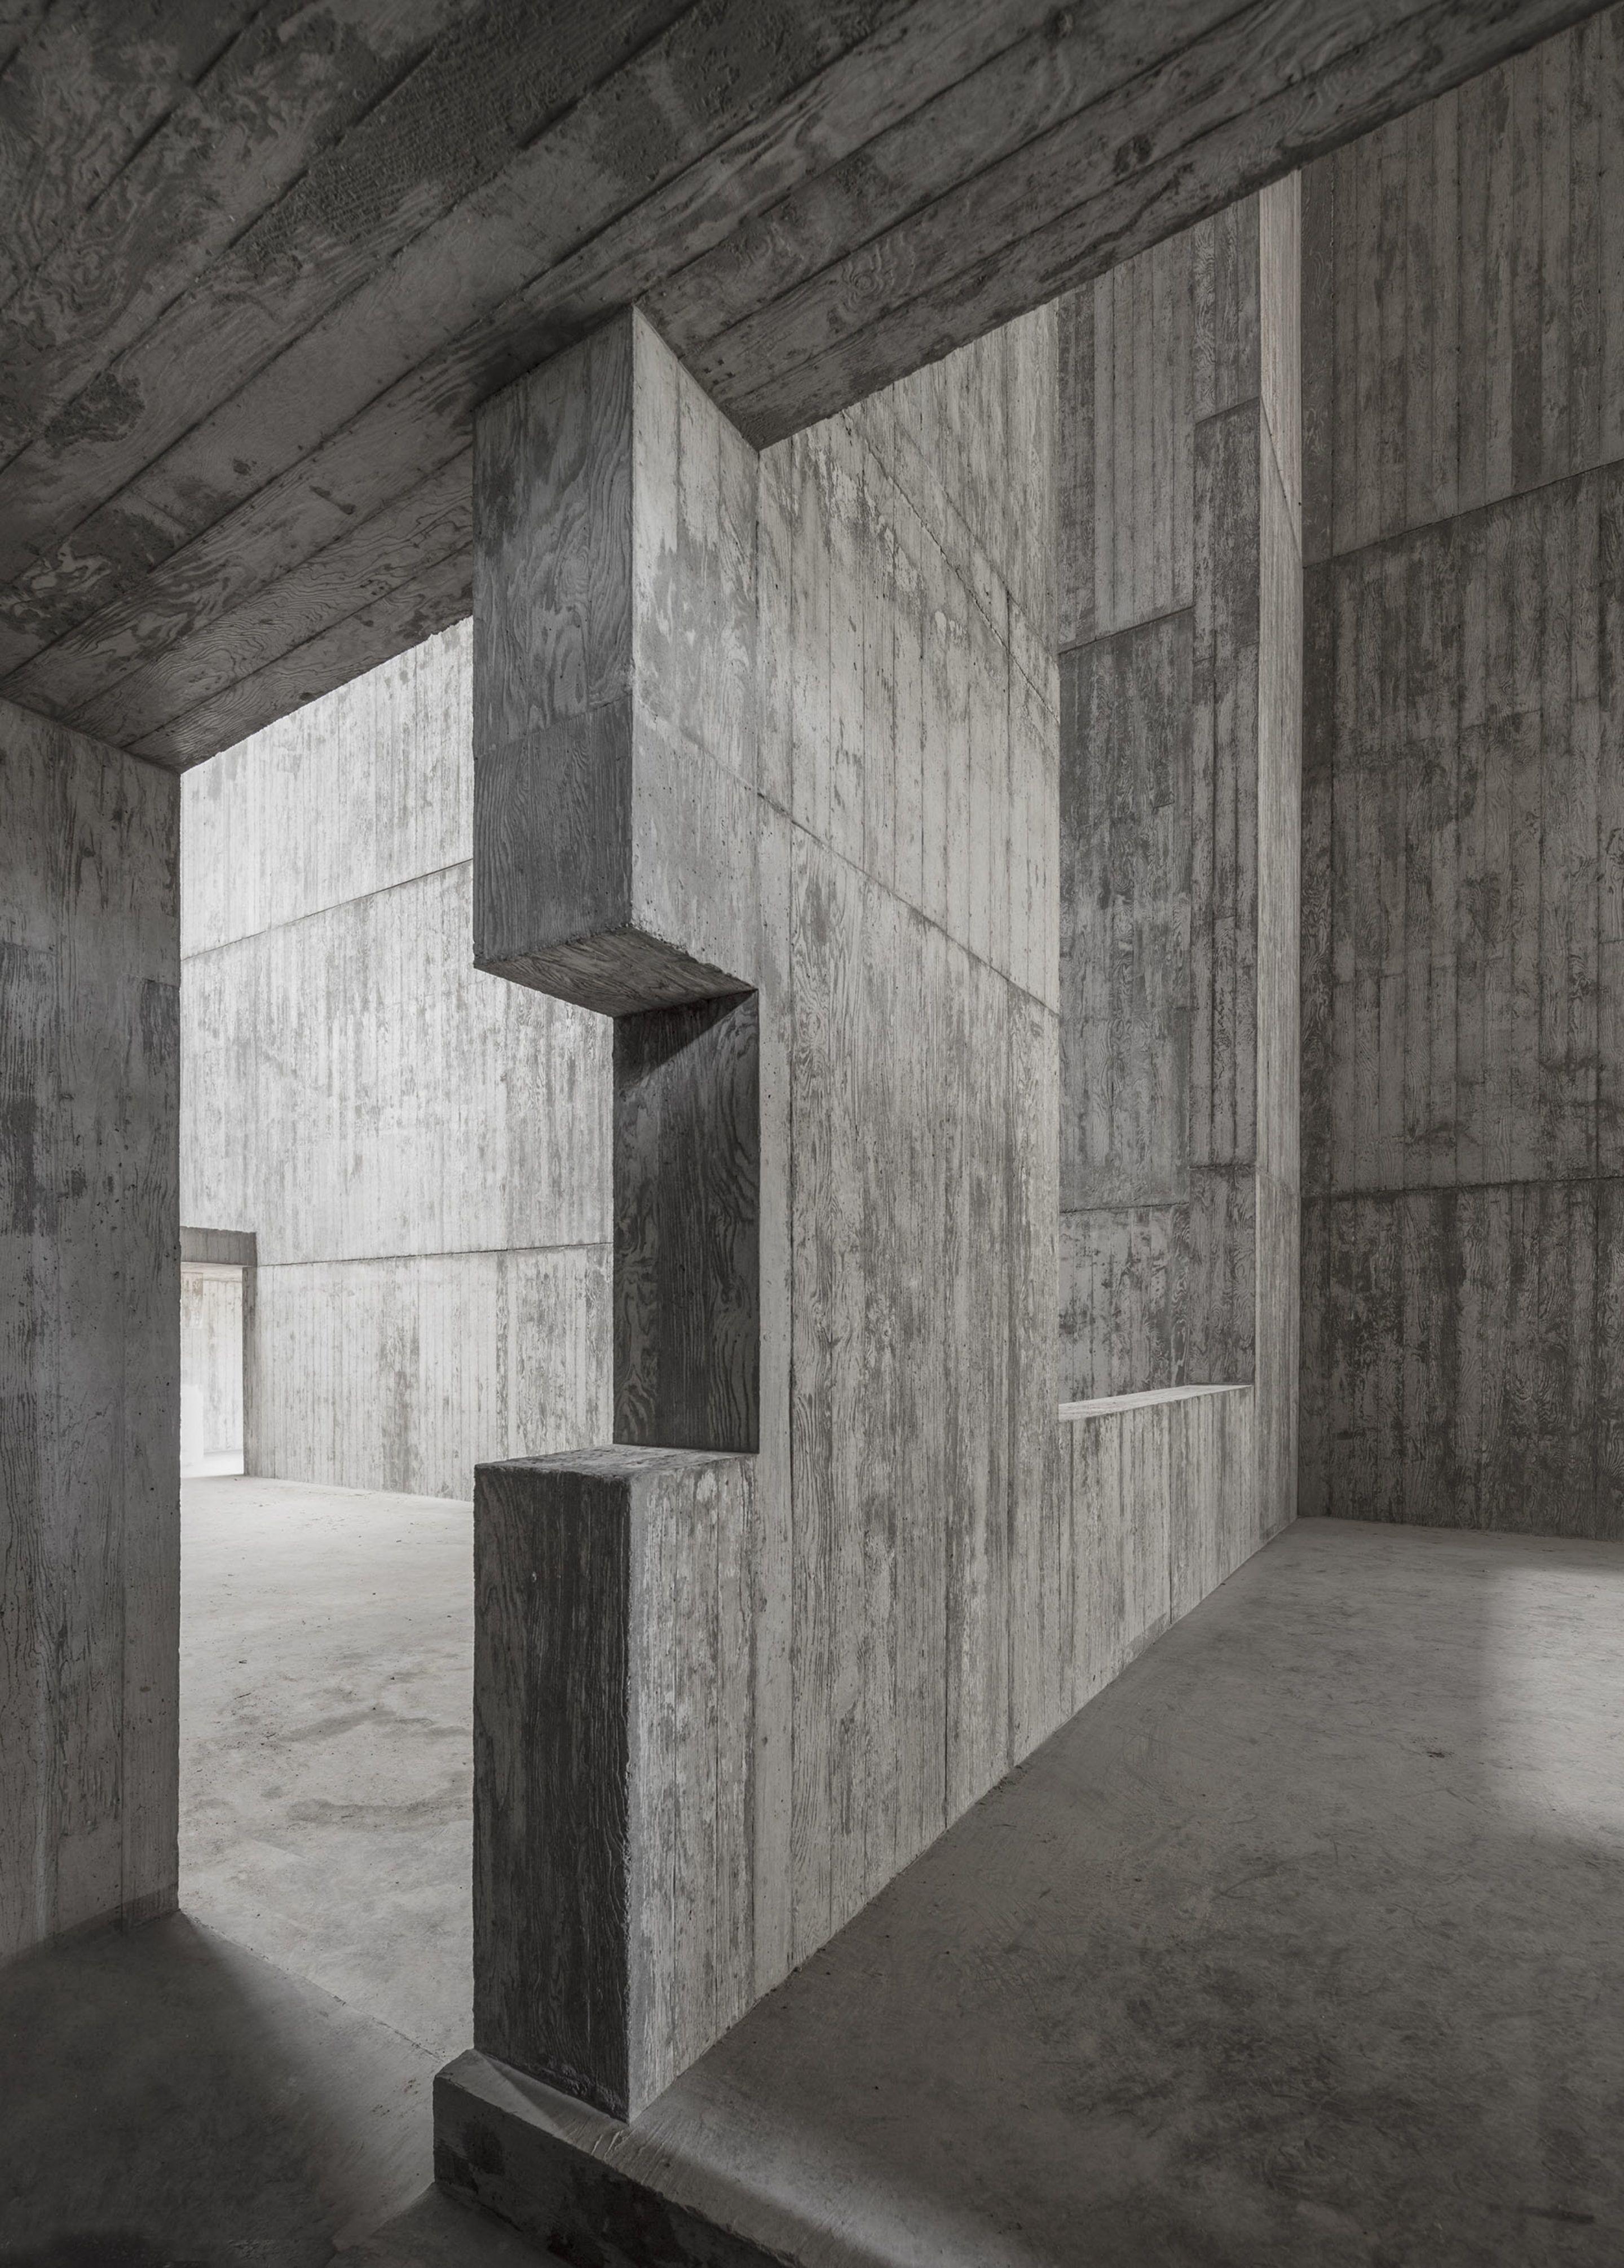 IGNANT-Architecture-Alvaro-Siza-Carlos-Castanheira-Art-Pavilion-Photographs-22